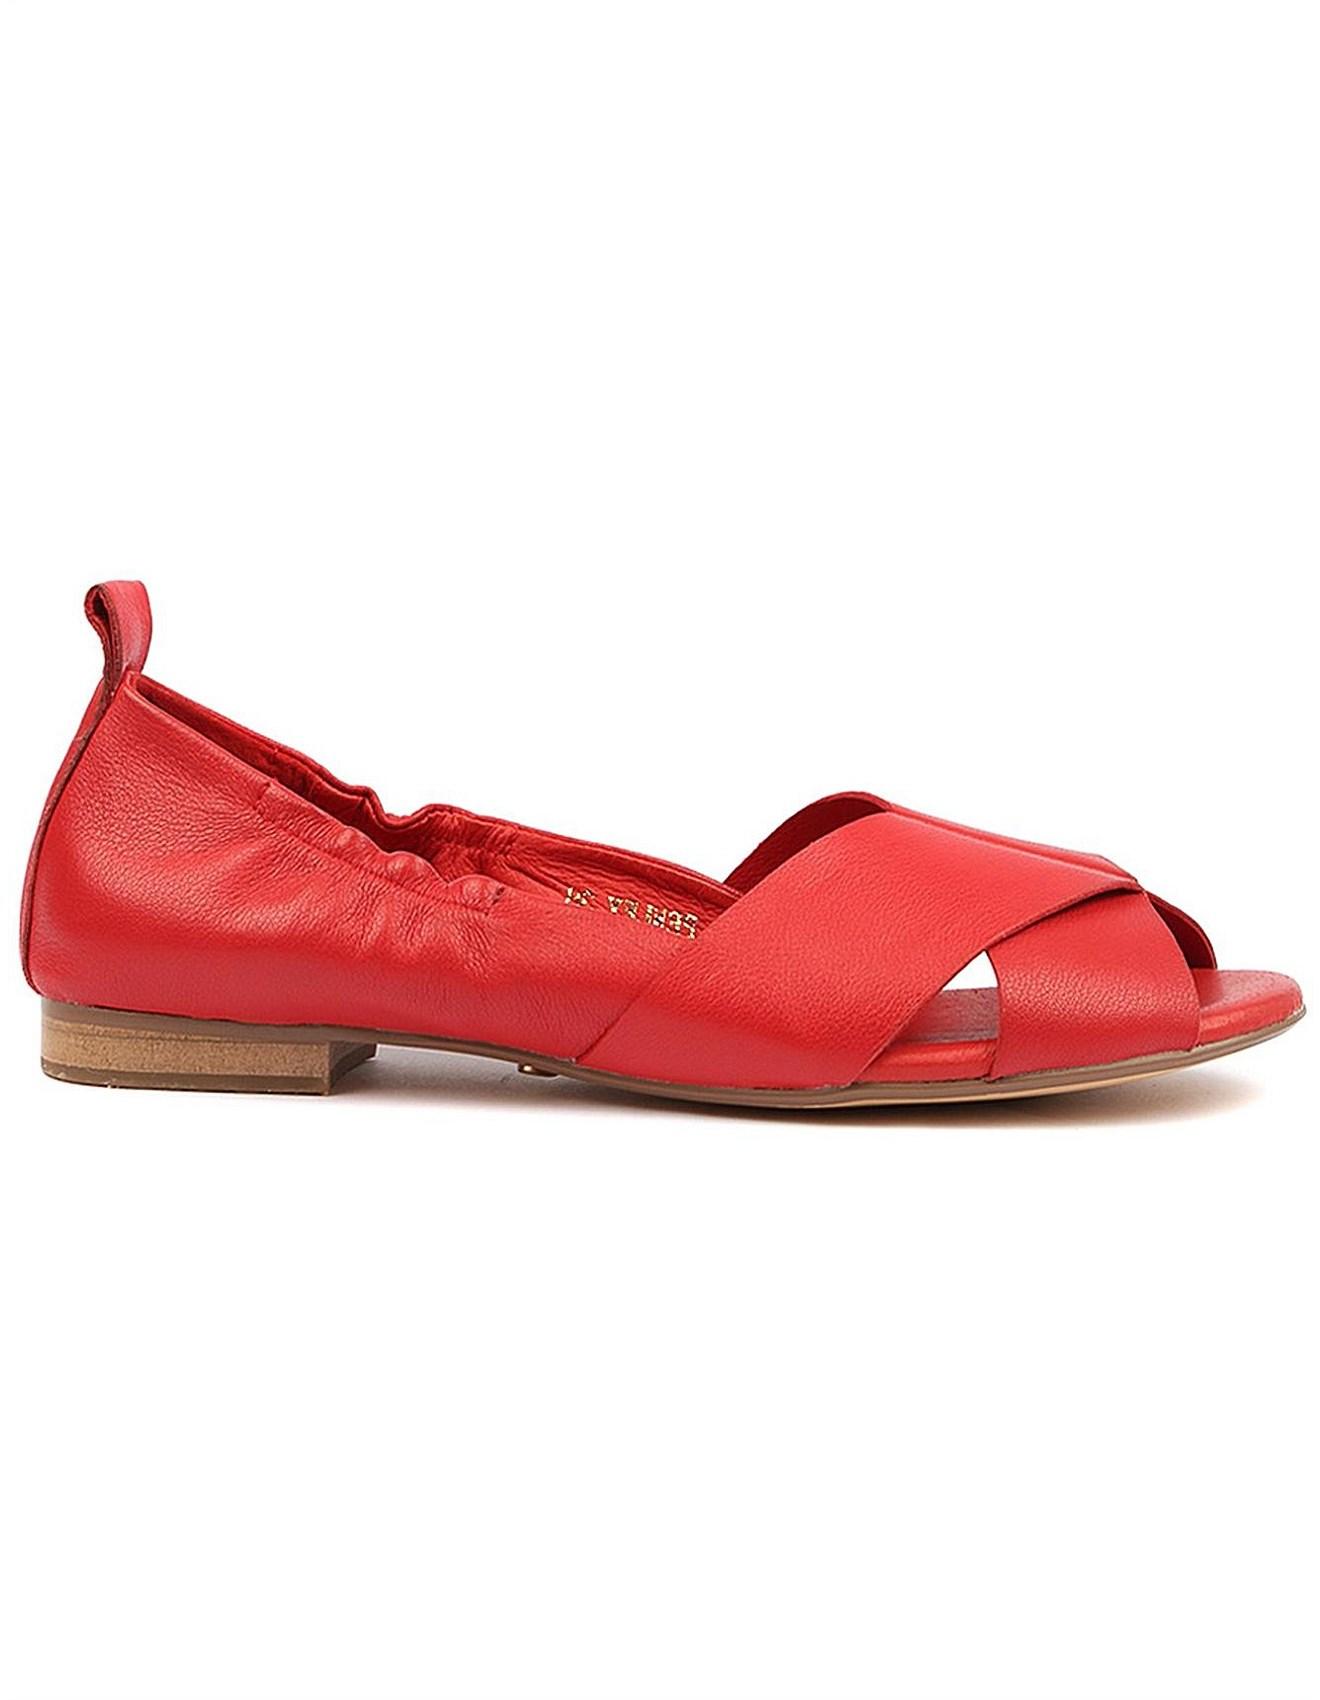 0792539394ab59 Women s Flat Sandals